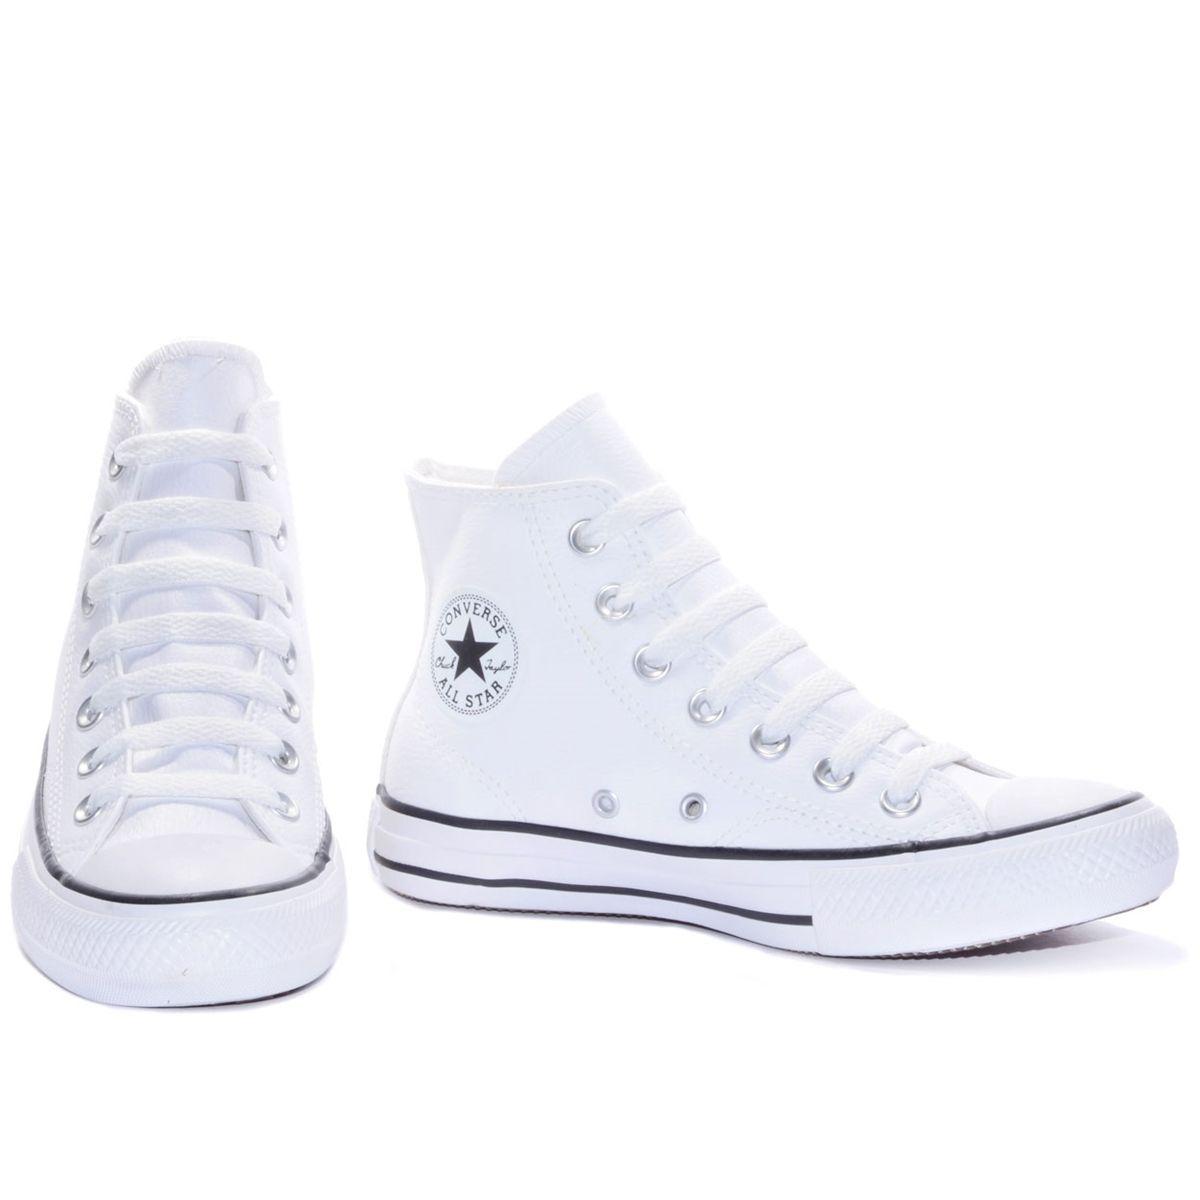 4c4aa6ba48 All Star cano médio branco